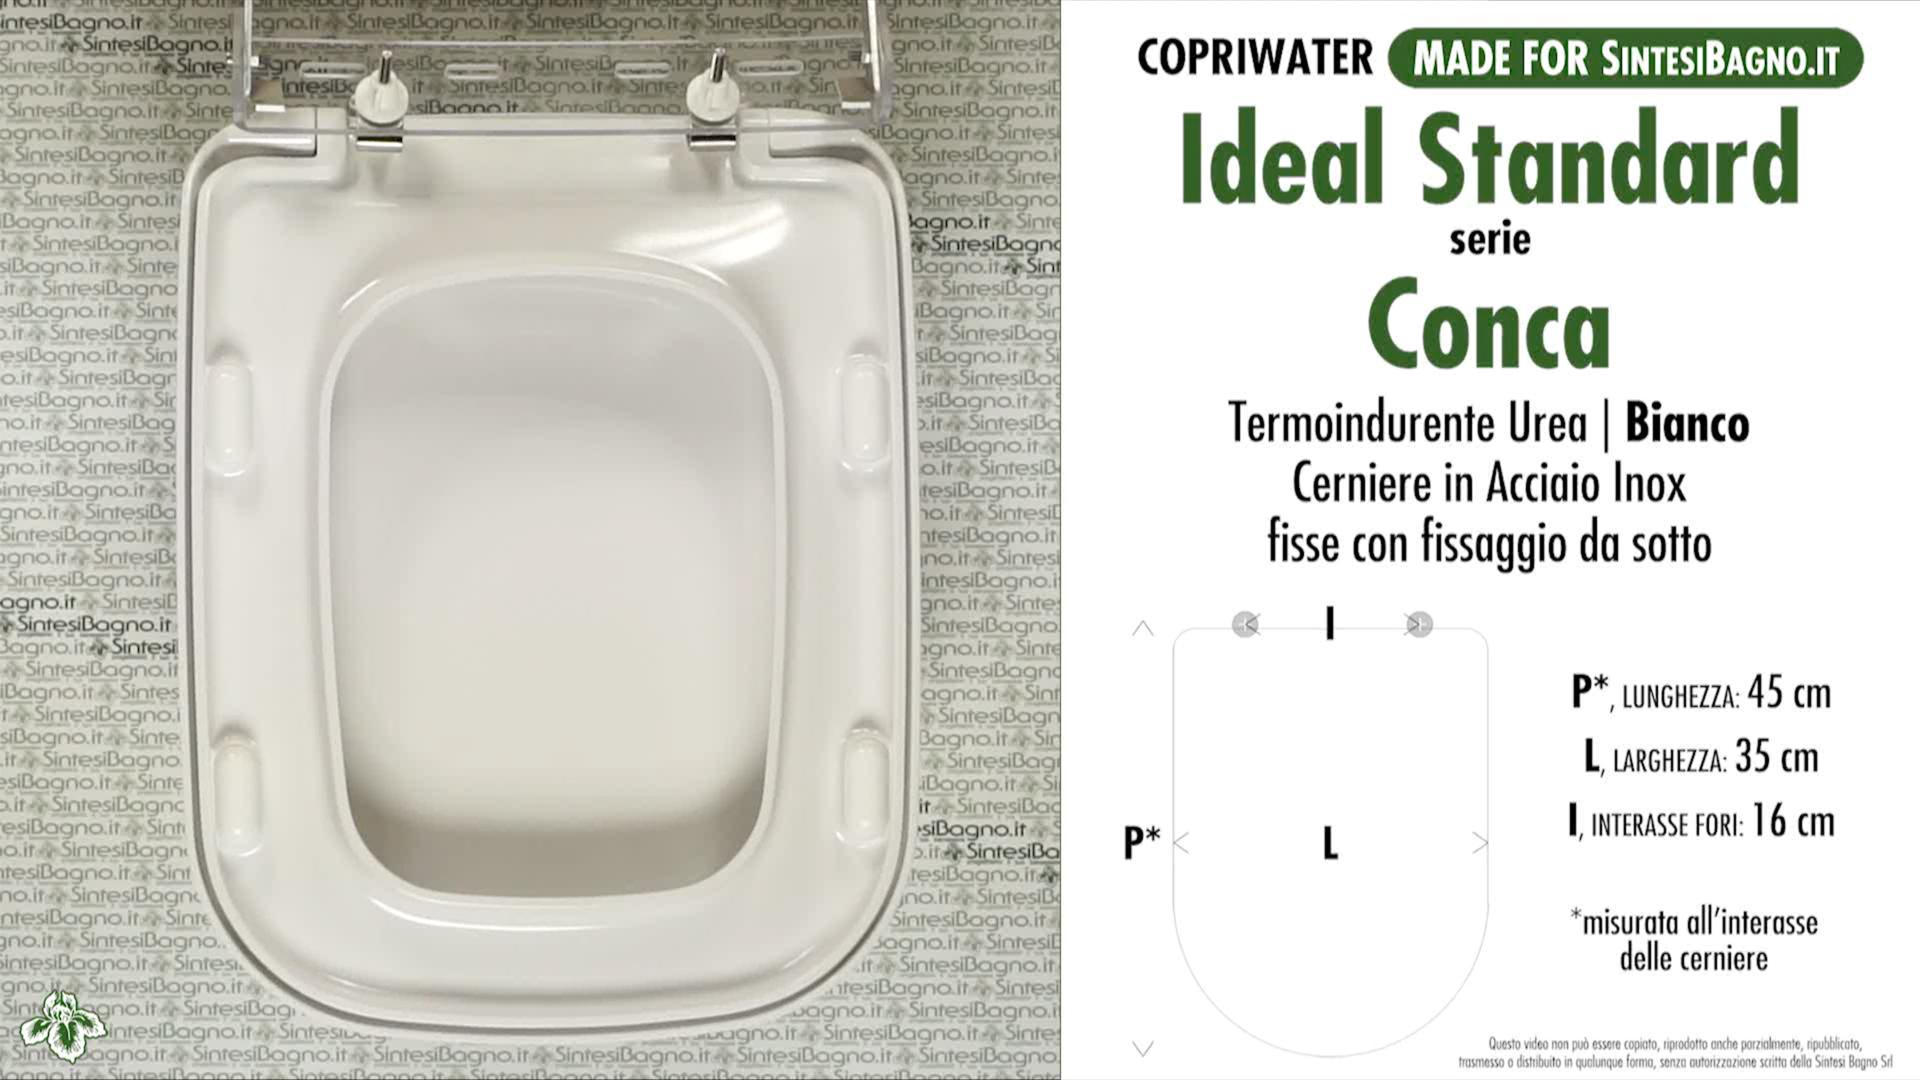 Copriwater per vaso ideal standard serie conca tipo for Copriwater conca ideal standard originale